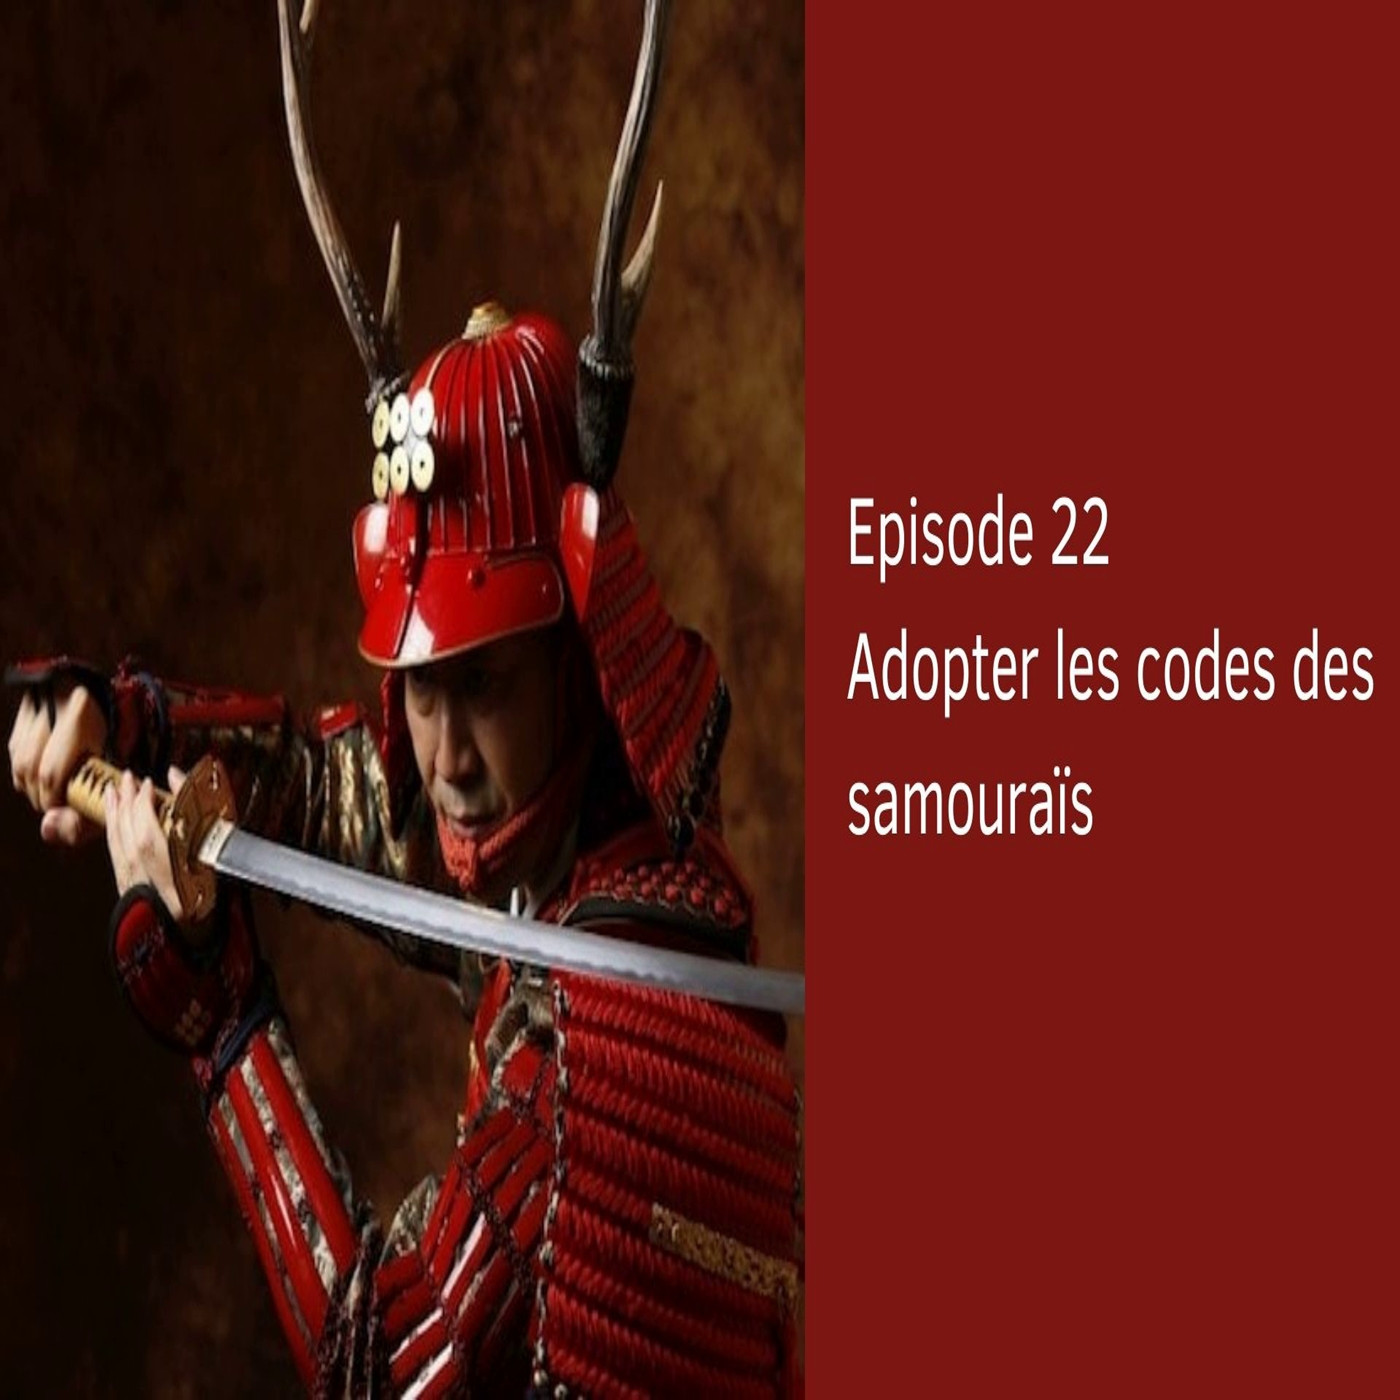 EPISODE 23 Adopter les codes du Samouraï au bureau